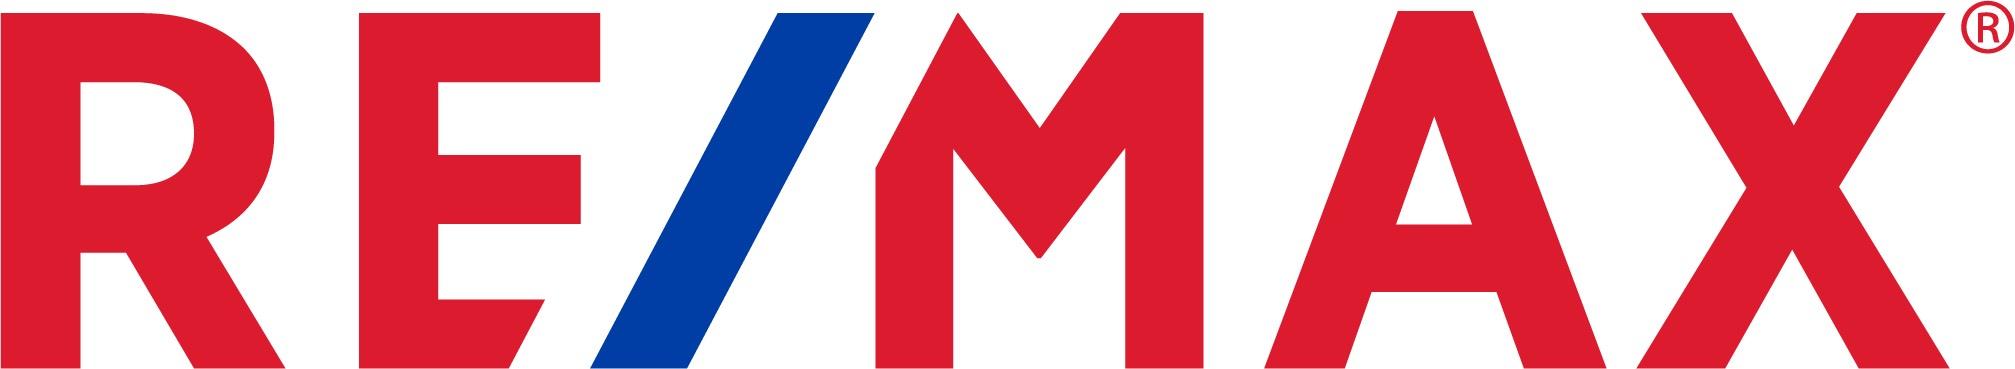 New REMAX Logo.jpg